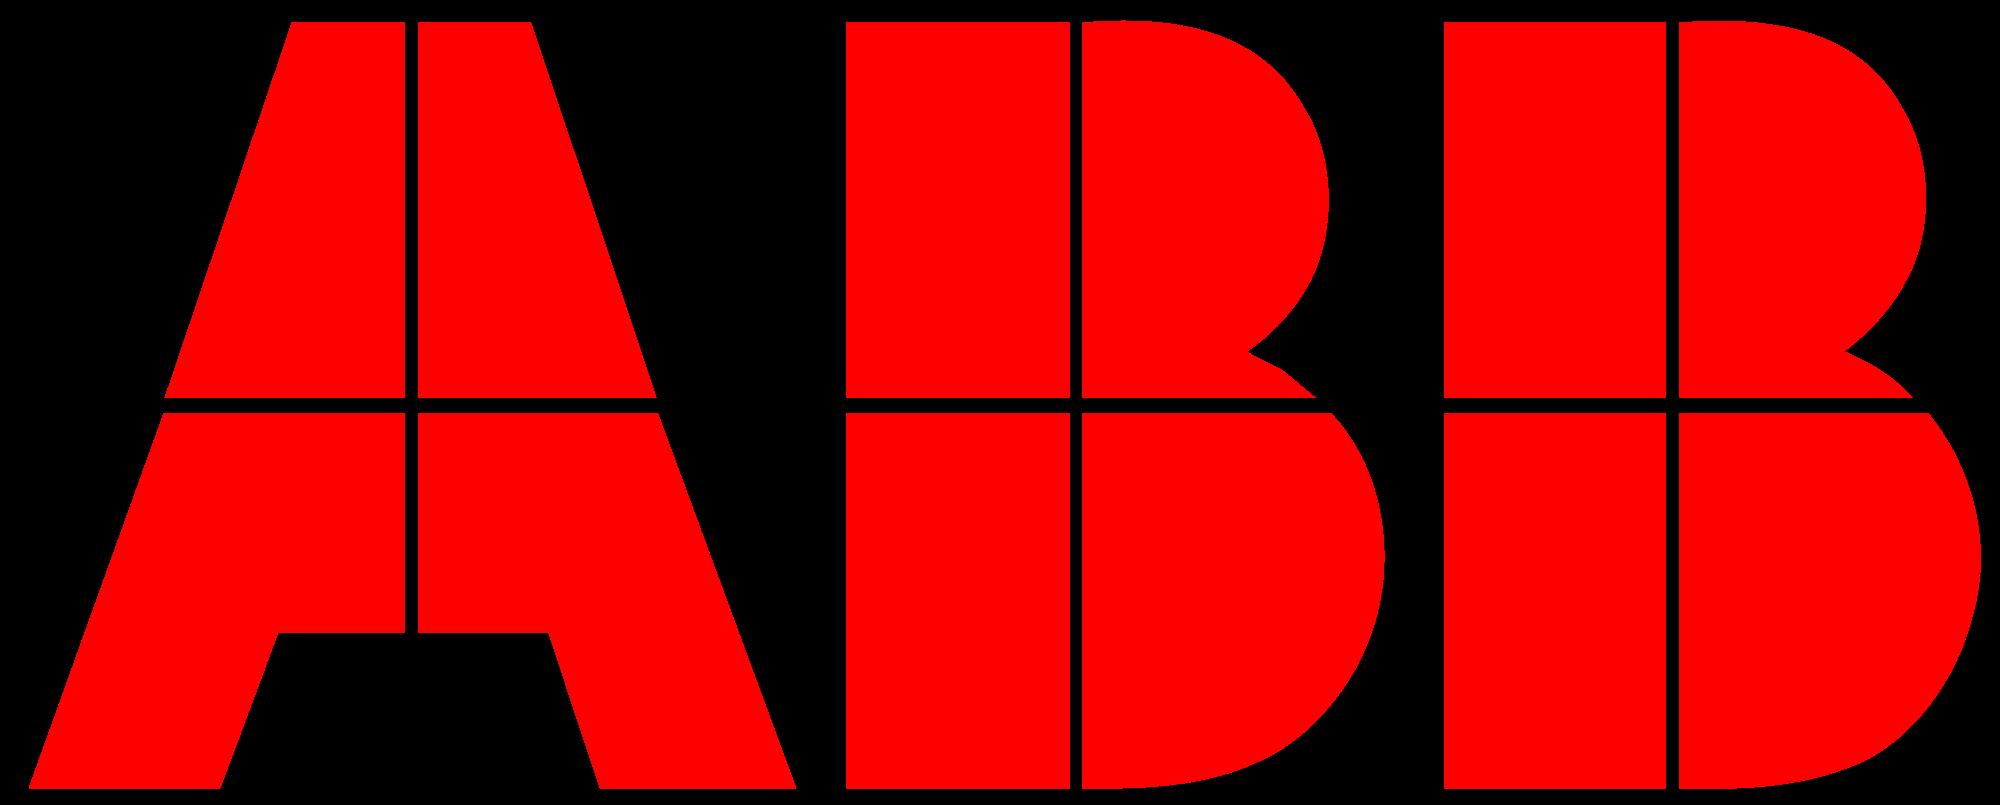 ABB Logo Wallpaper